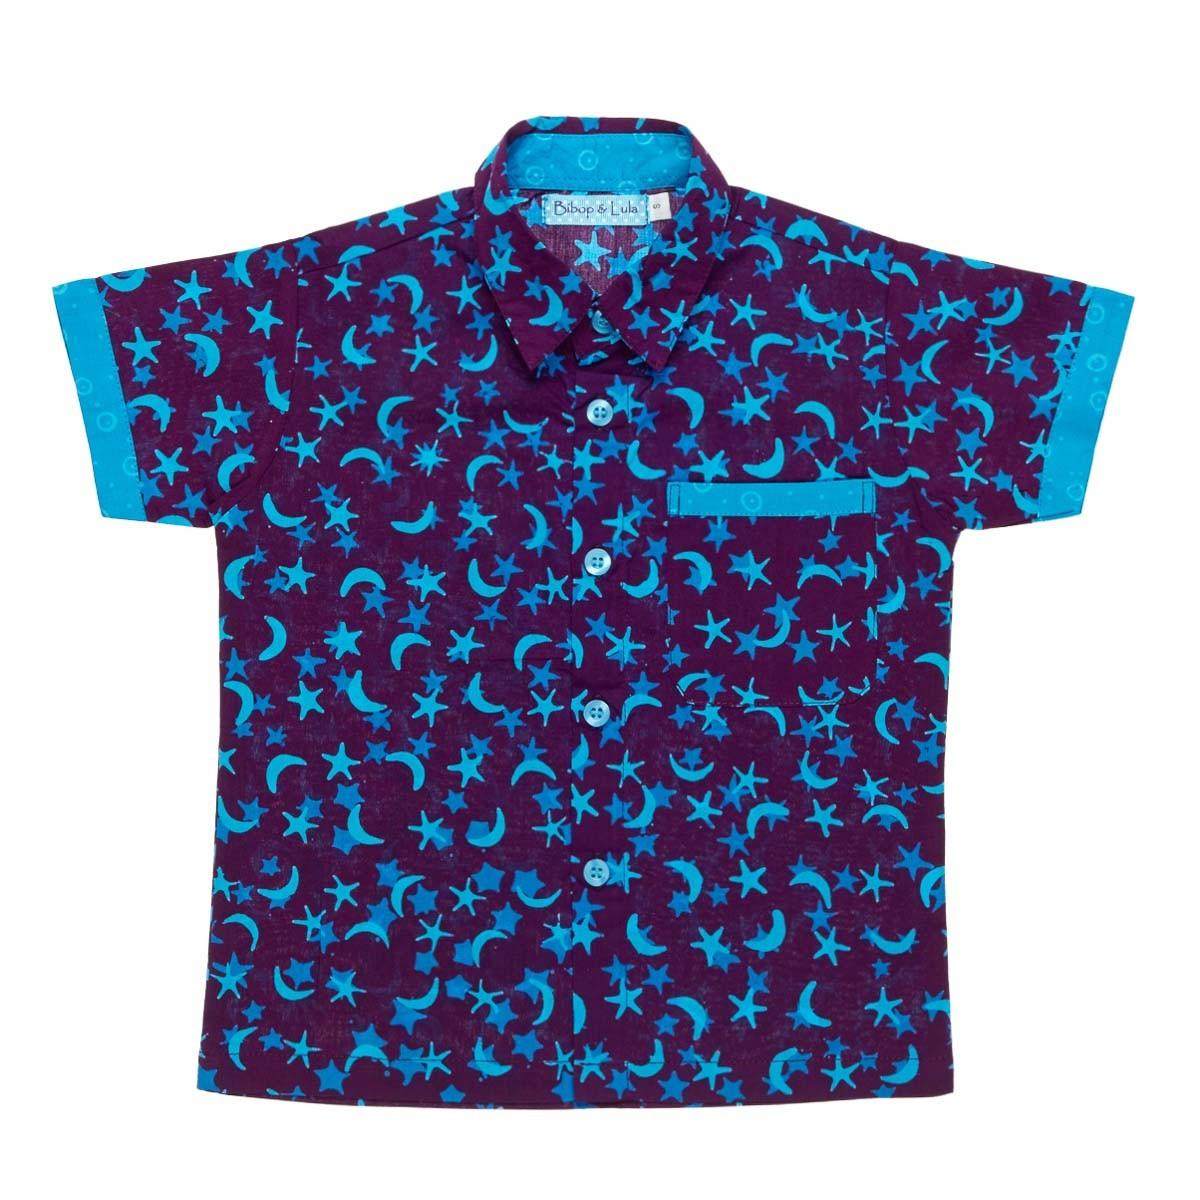 Chemise coton garçon 2-8 ans bleu Manille